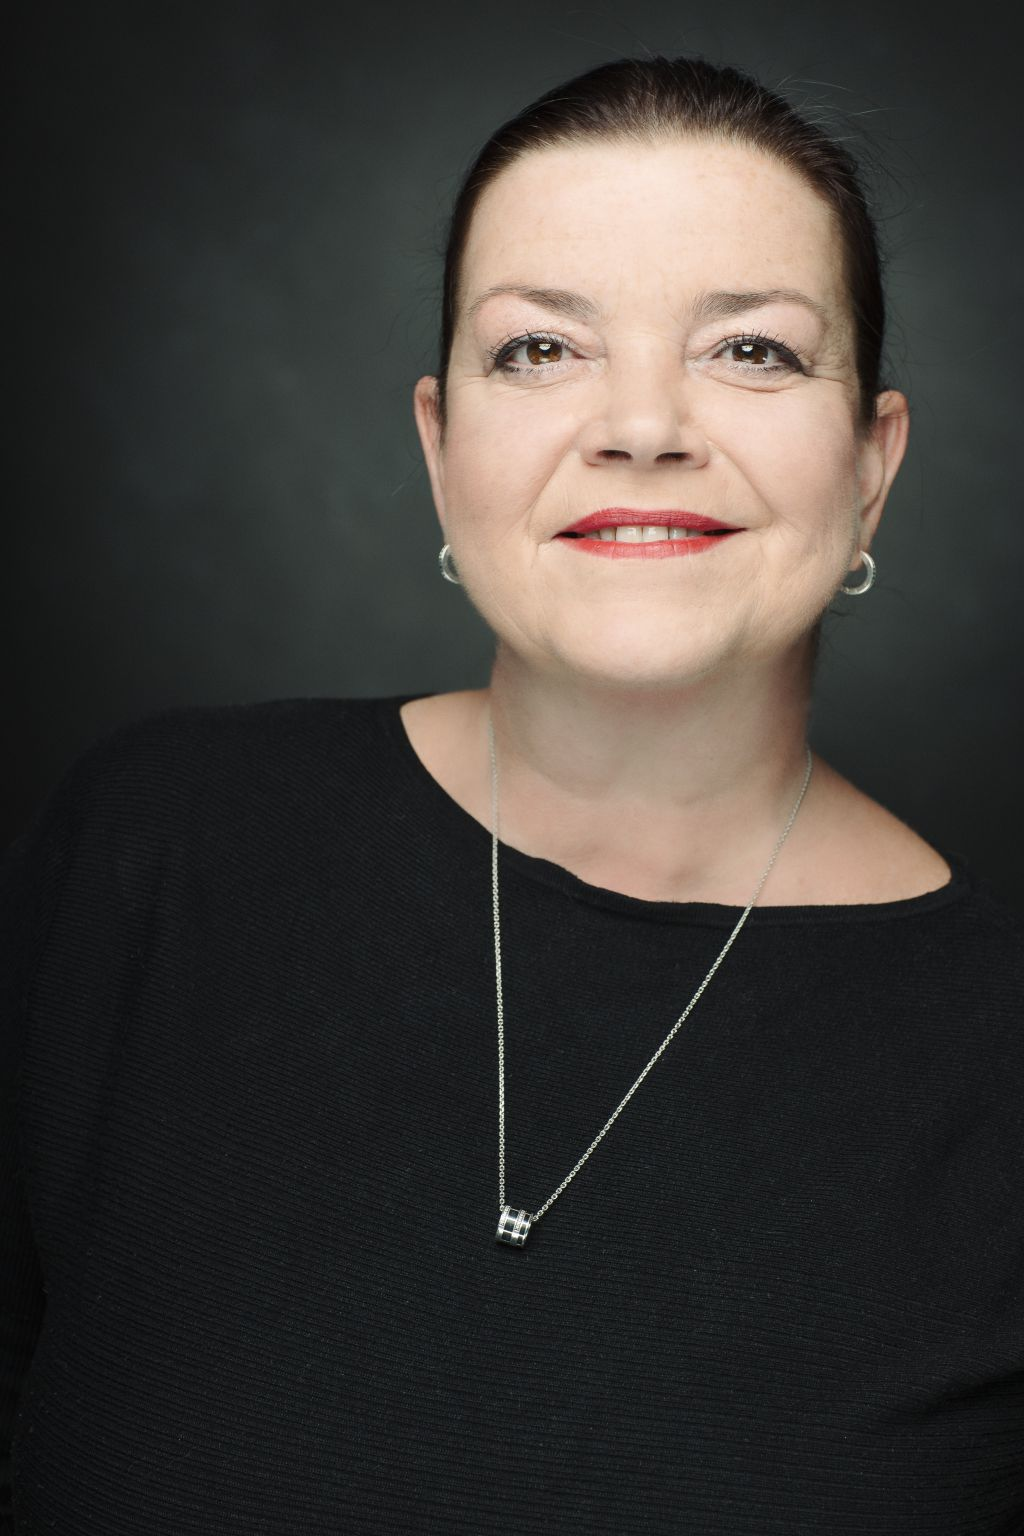 Kati Grasse